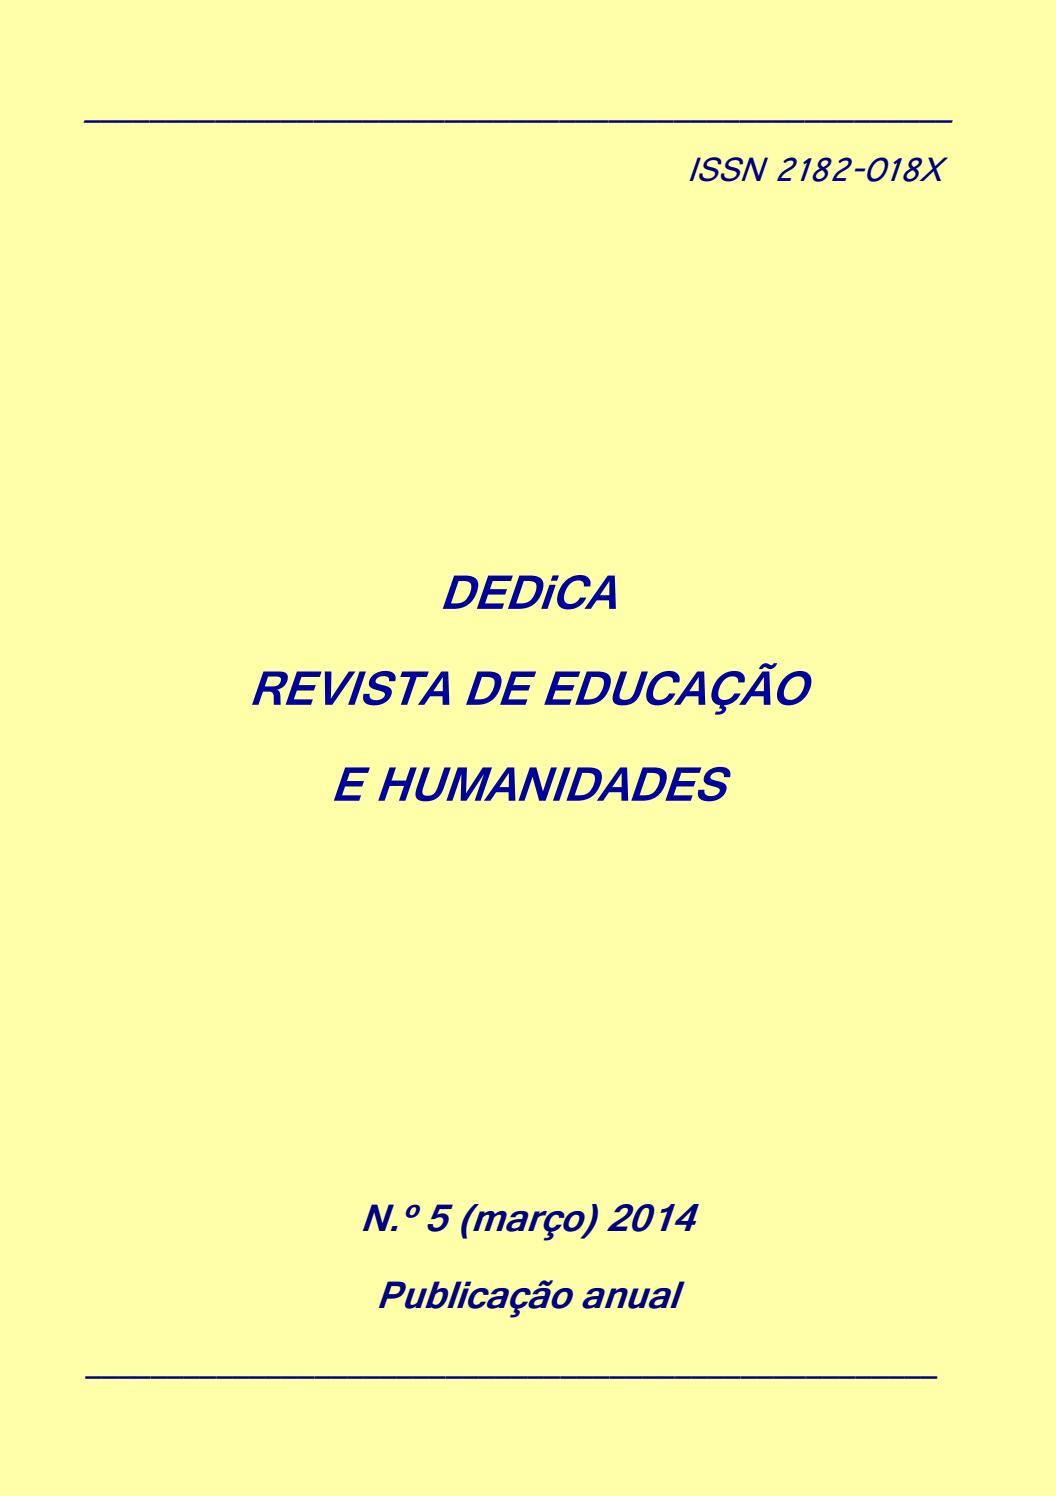 Dedica Nº 5 2014 Issn 2182 018x By Dedica Revista De Educacao E Humanidades Issuu